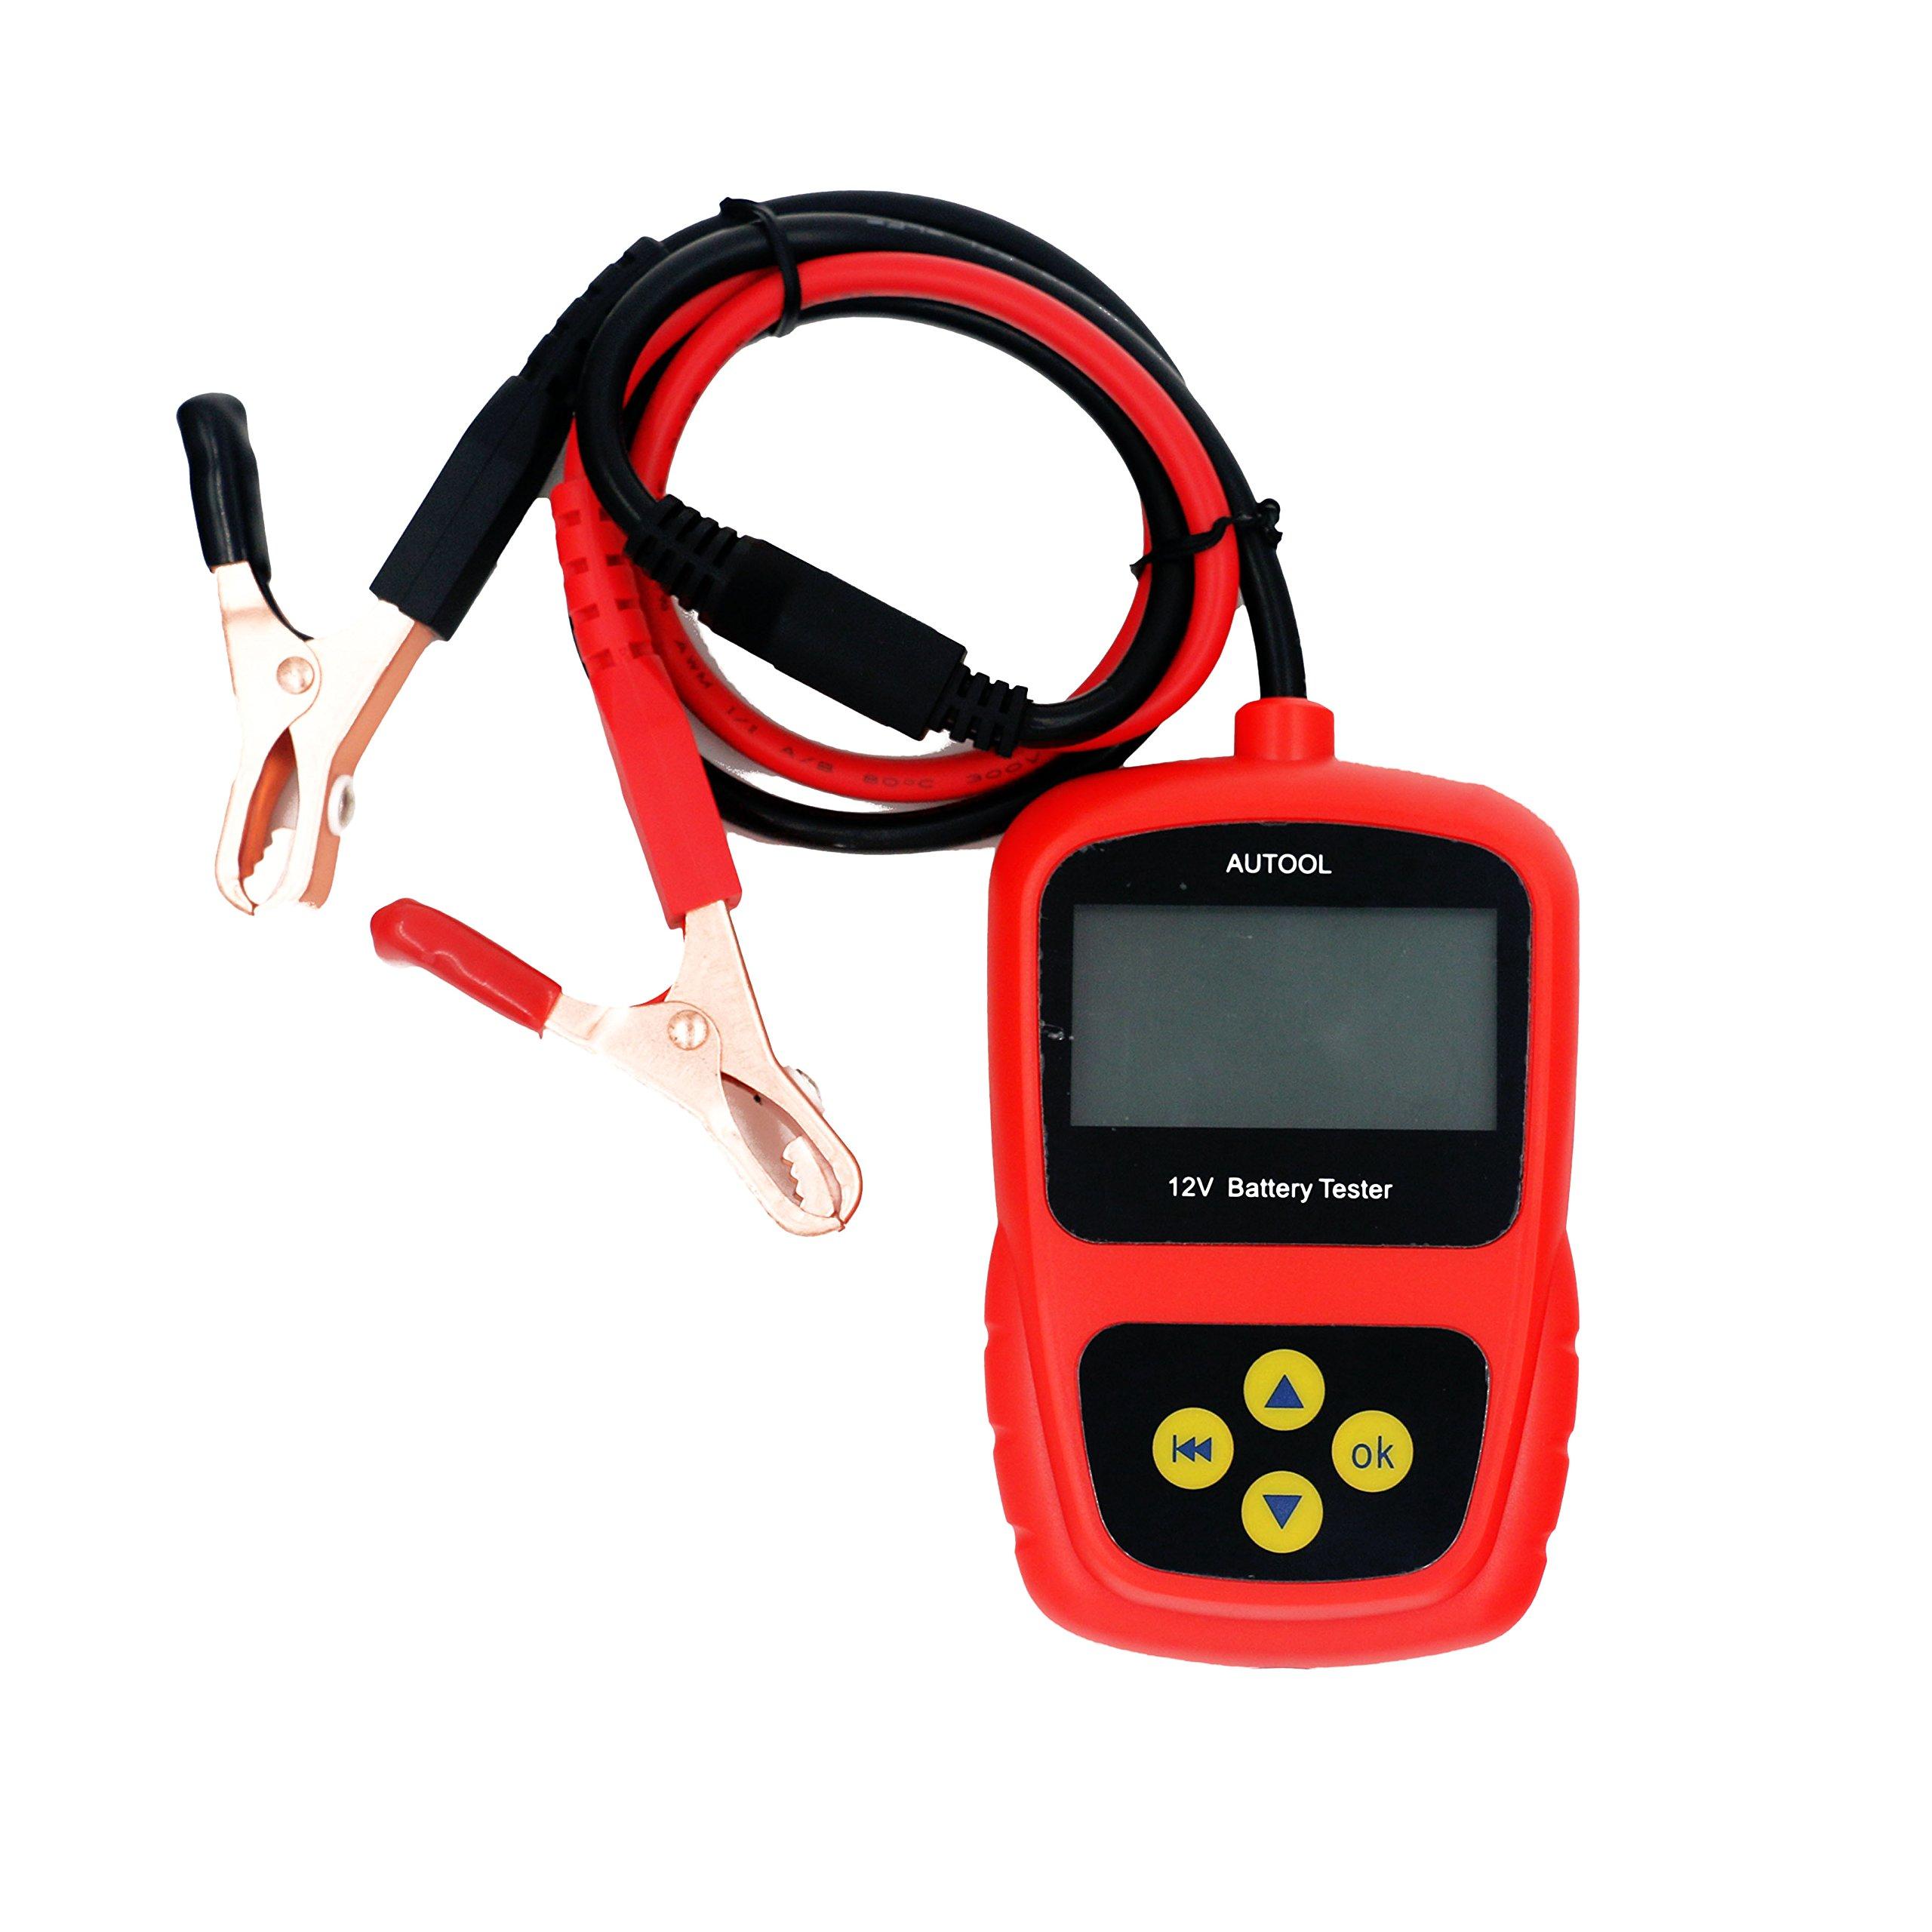 Autool Launch BST-100 Auto Car Battery System Tester Lead Acid Test Diagnostic AGM GEL 12V BST 100